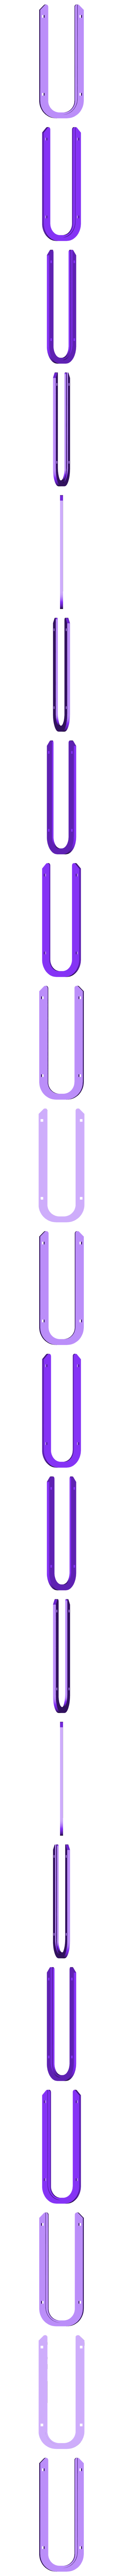 U.stl Download free STL file Dolce Gusto Capsule Holder • 3D printer object, MVSValero